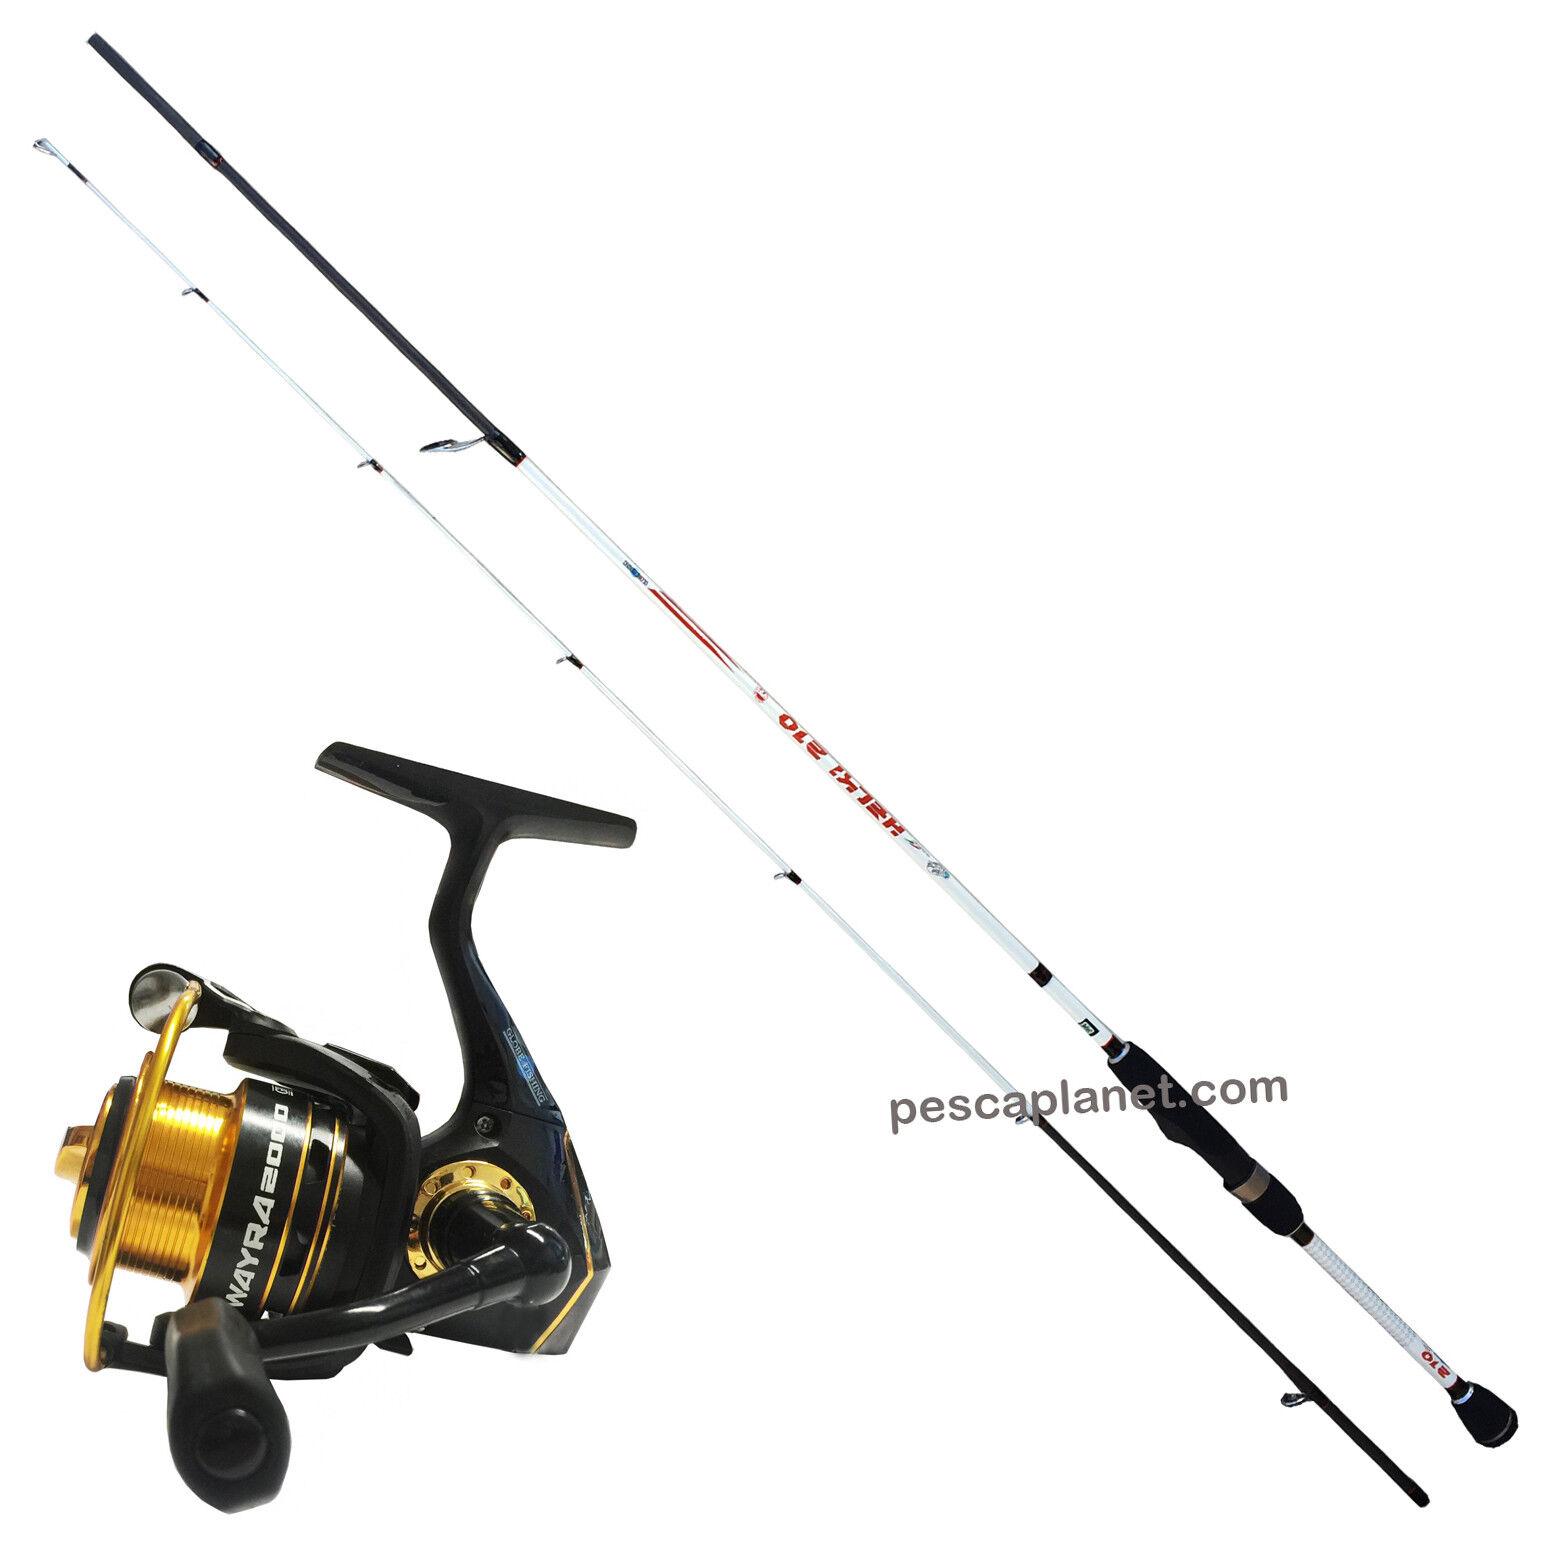 KP3550 Kit Pesca Trout Area Globe Fishing Canna Helki 1,90 m + Mulinello Wa PP